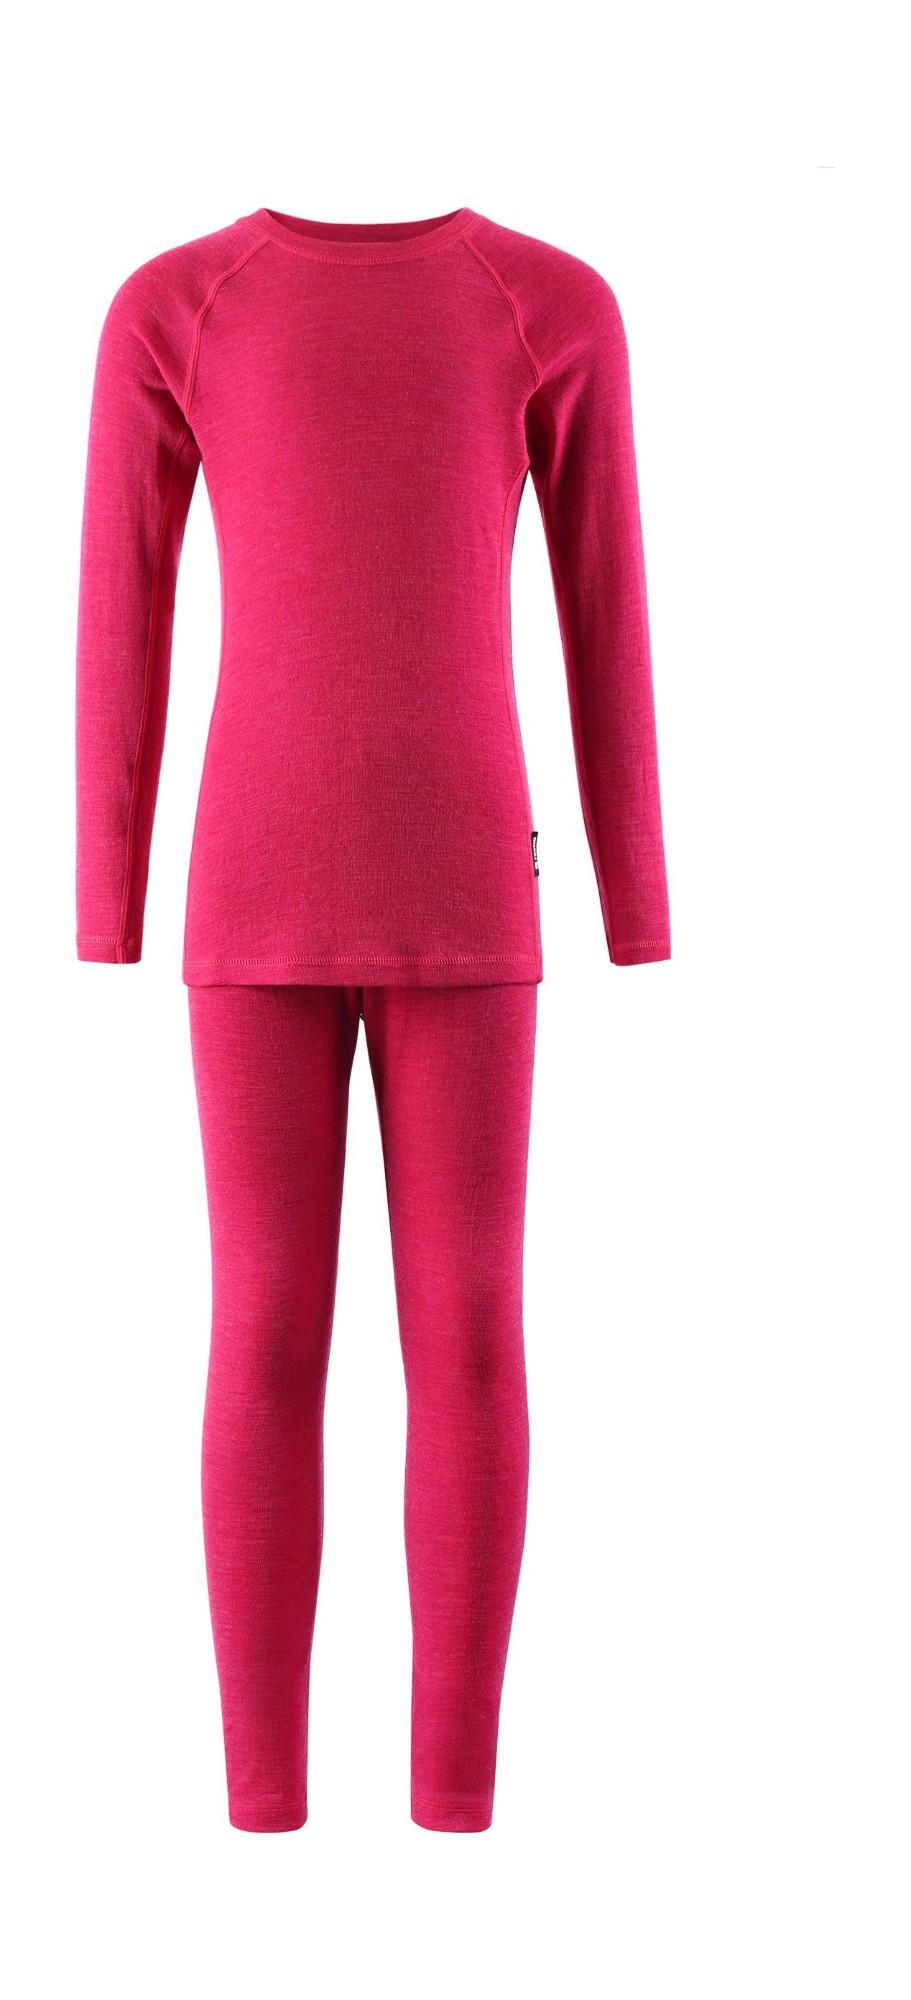 REIMA Kinsei Raspberry Pink 120